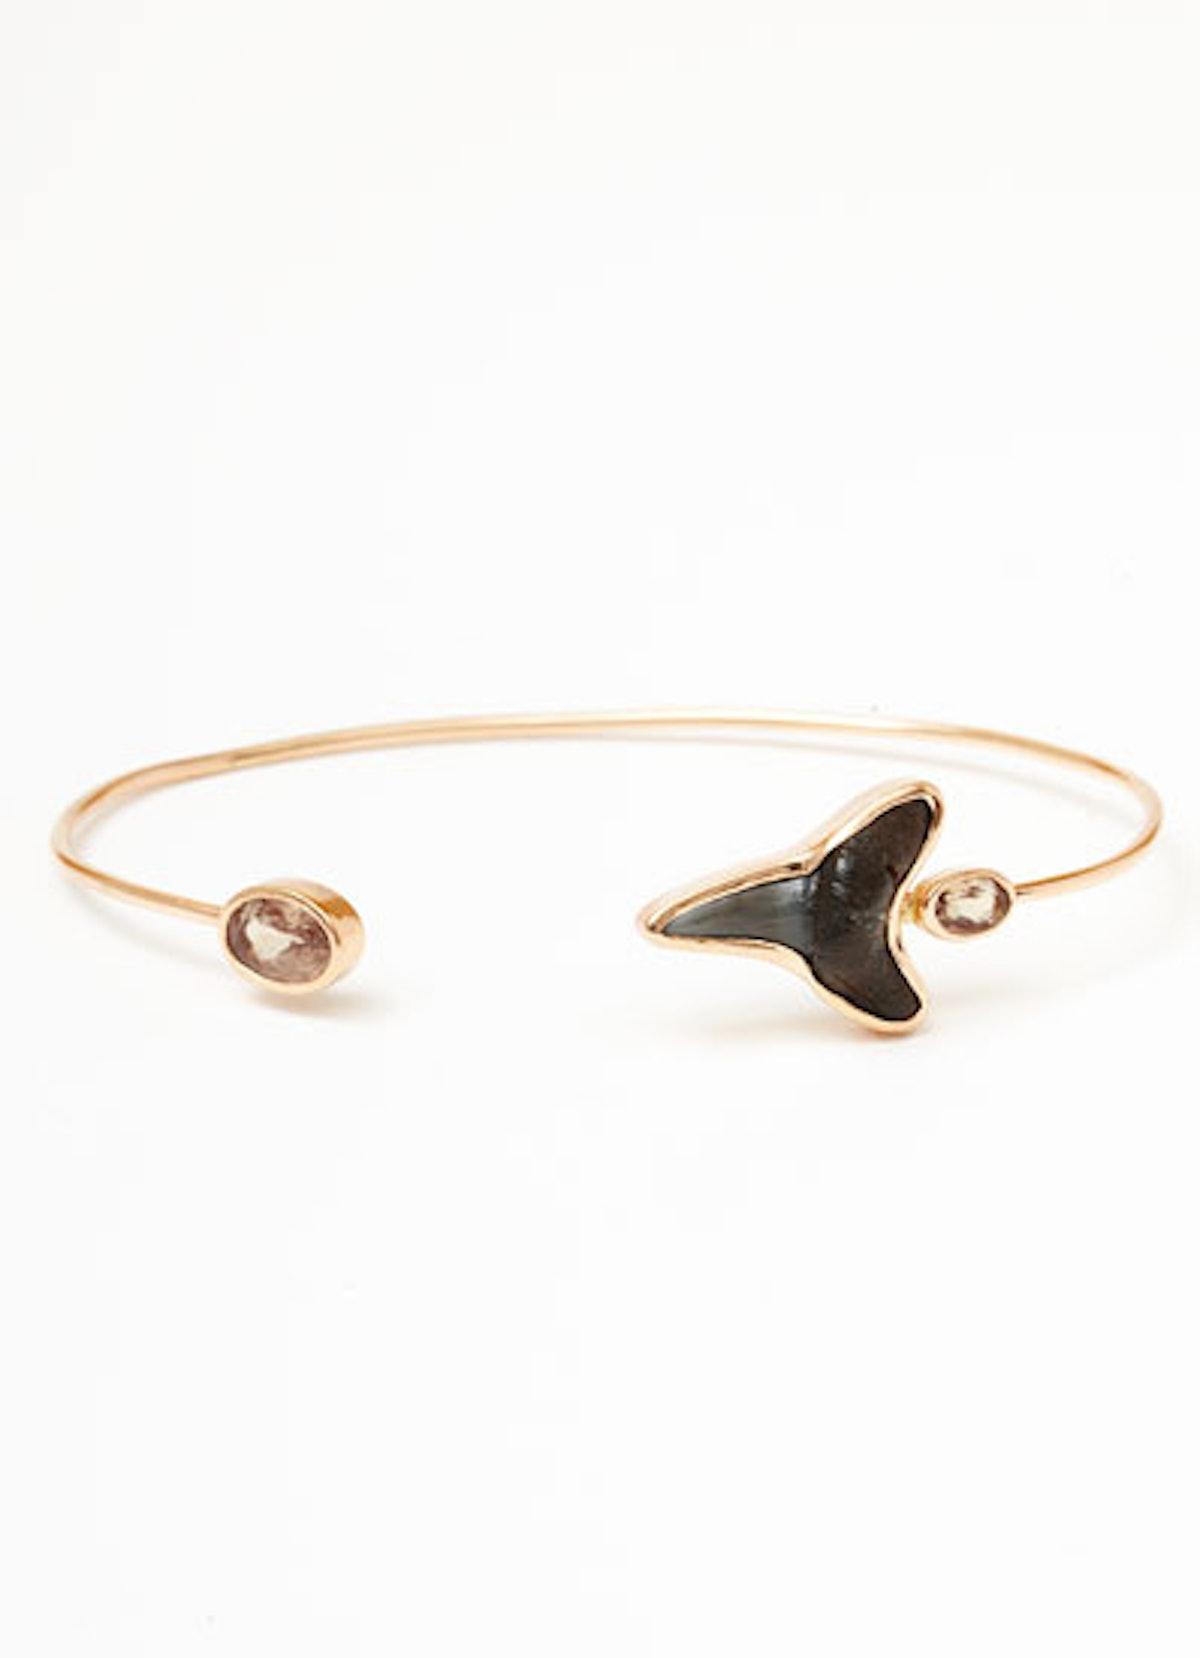 acss-shark-jewelry-04-v.jpg